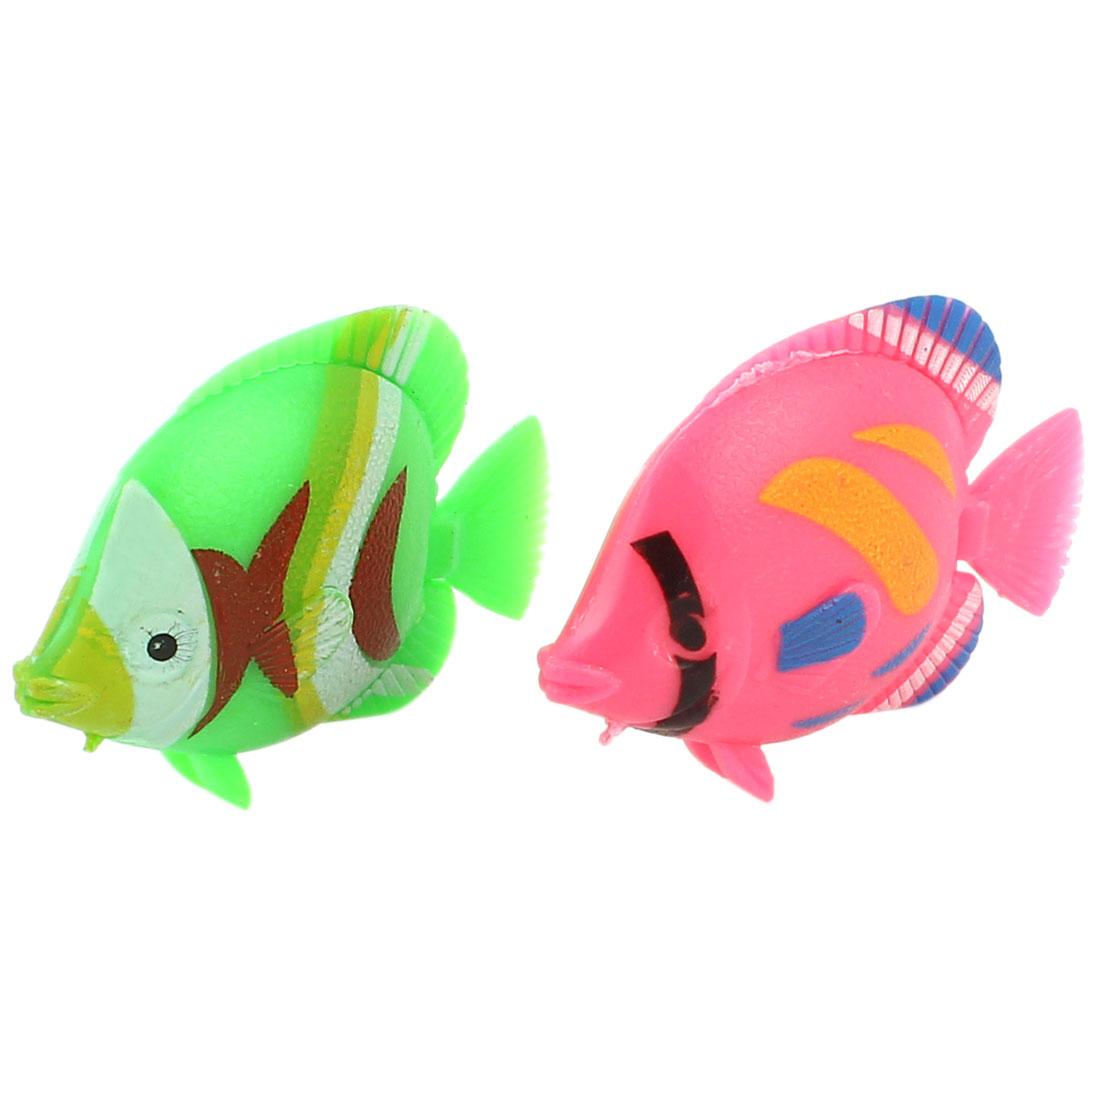 2Pcs Plastic Artificial Swing Tail Floating Fish Aquarium Decor Green Pink